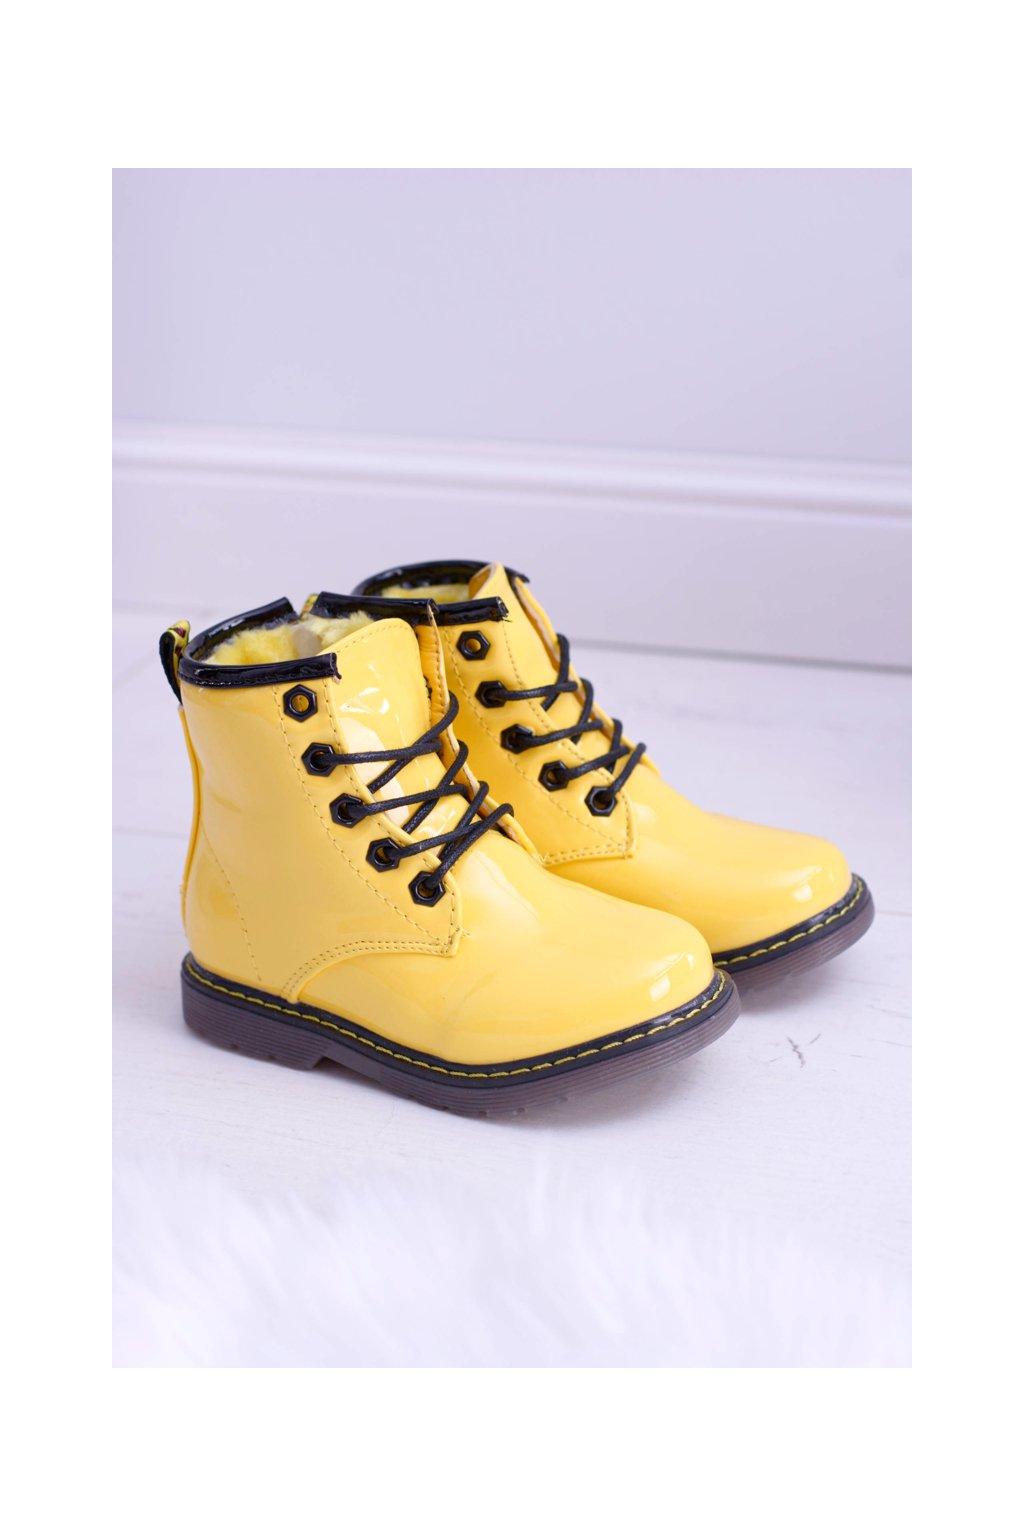 Detské topánky dievčenské chlapčenská obuv teplé lakované žlté Ferrero